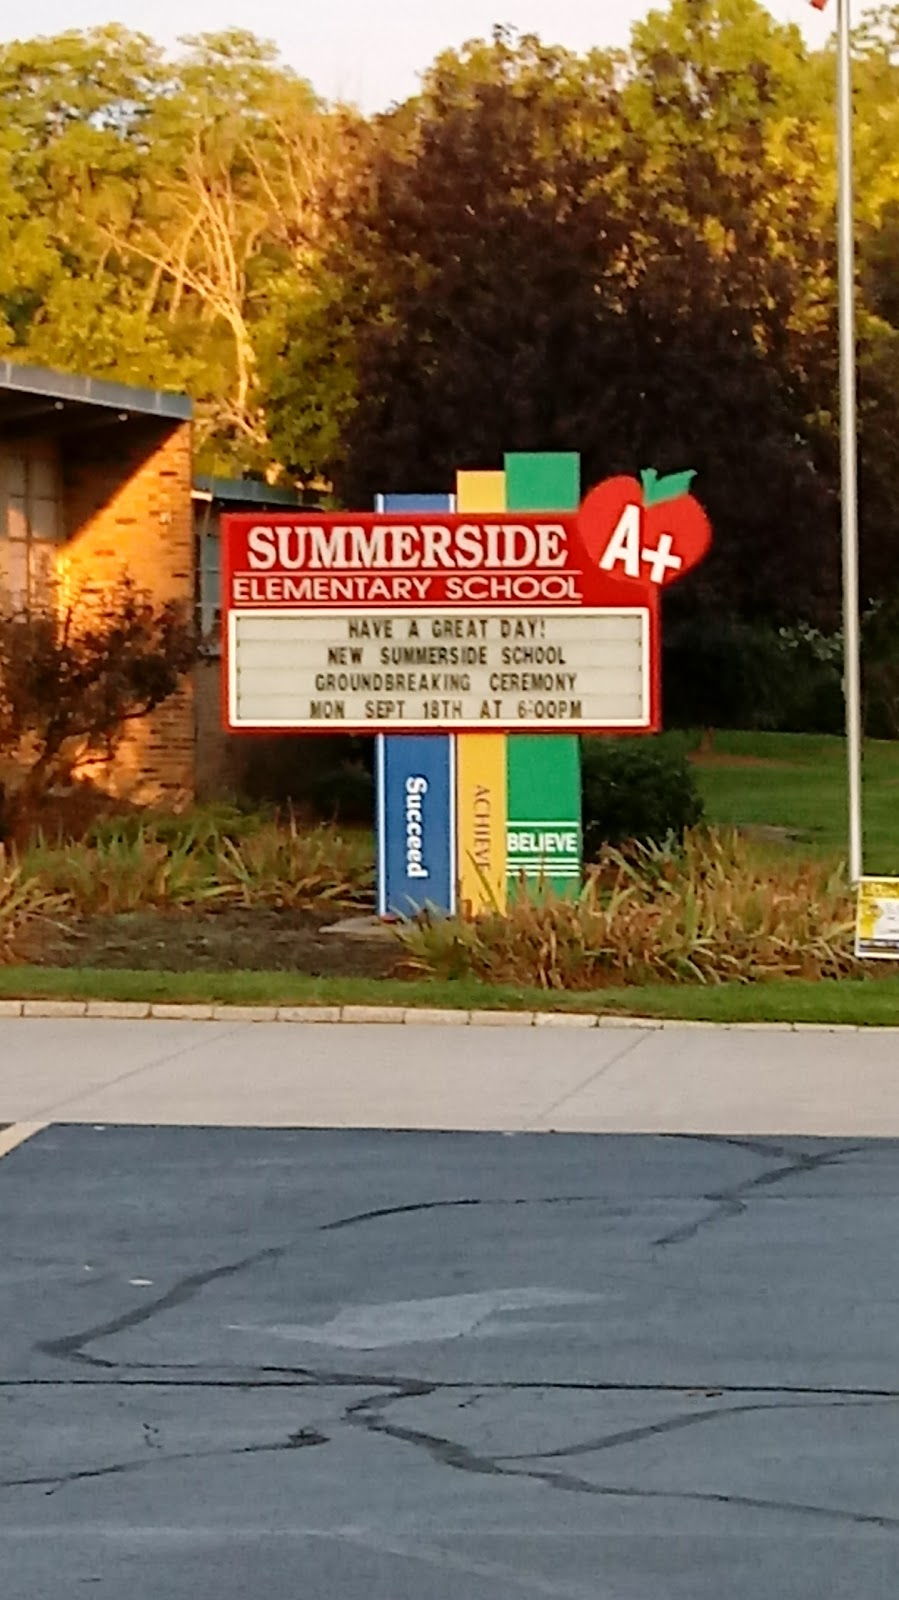 Summerside Elementary School - school    Photo 2 of 10   Address: 4639 Vermona Dr, Cincinnati, OH 45245, USA   Phone: (513) 947-7900